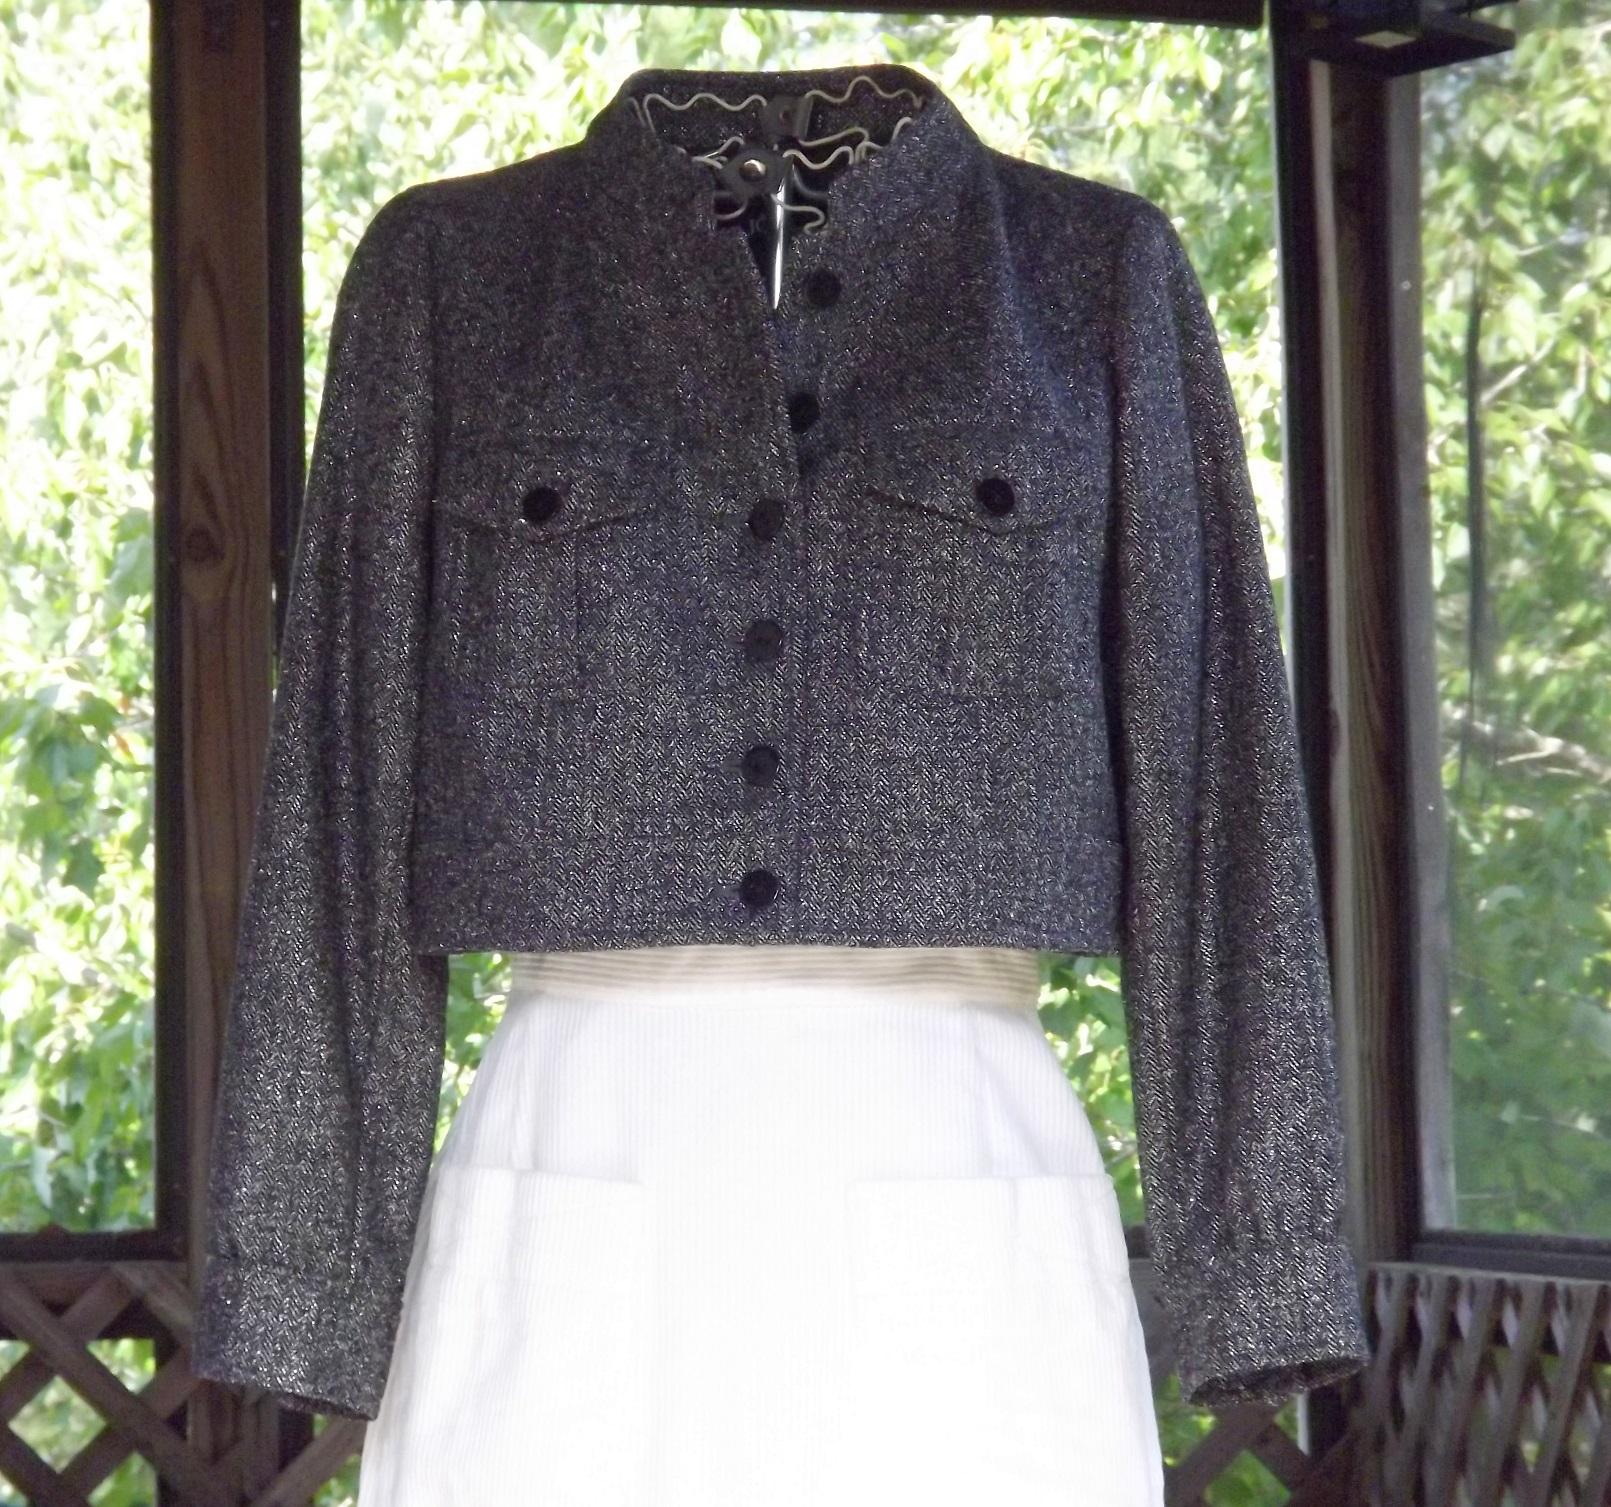 1S/&1M Black Sparkle and Silver Bolero Jacket